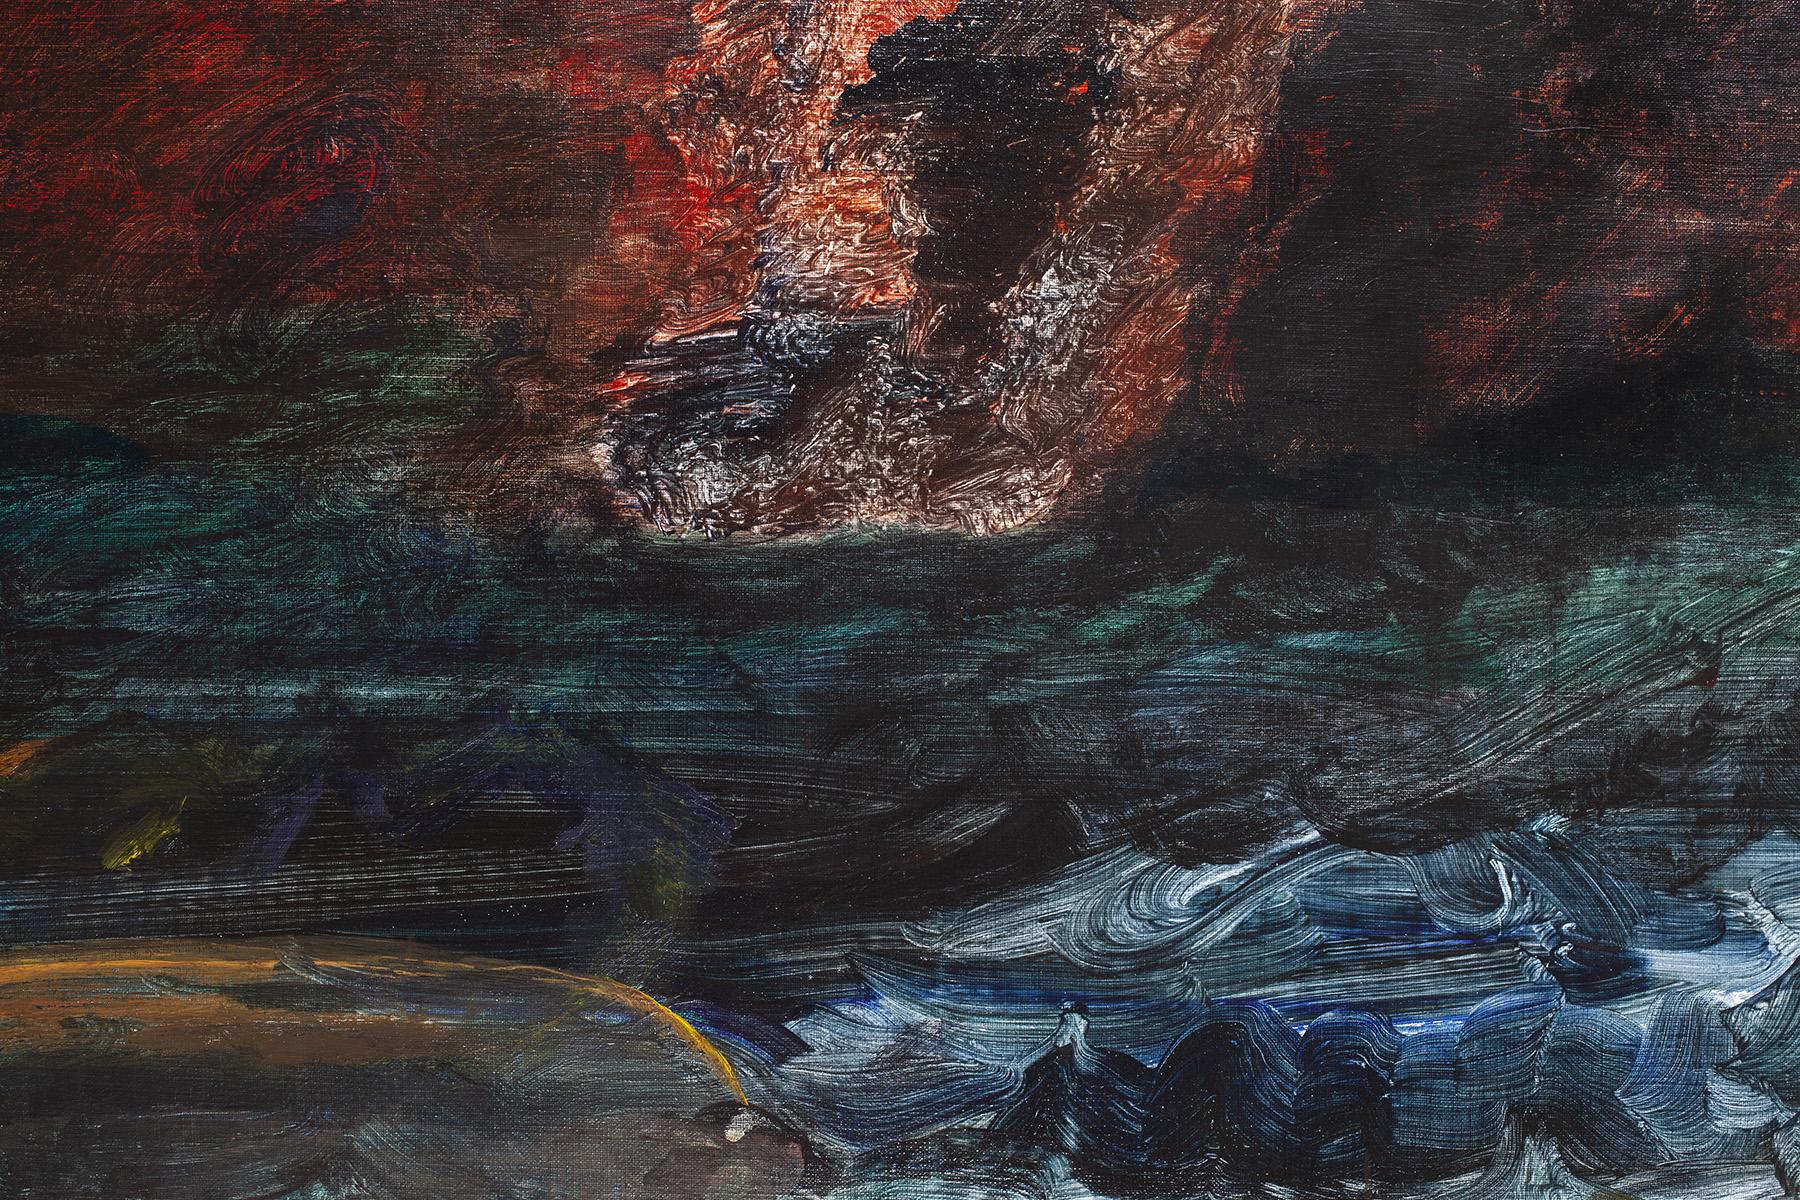 9.) Ono, Boat Sinking. 2018.  Acrylic on canvas, 38.25 in x 53 in (97.2 cm x 134.6 cm) copy.jpg